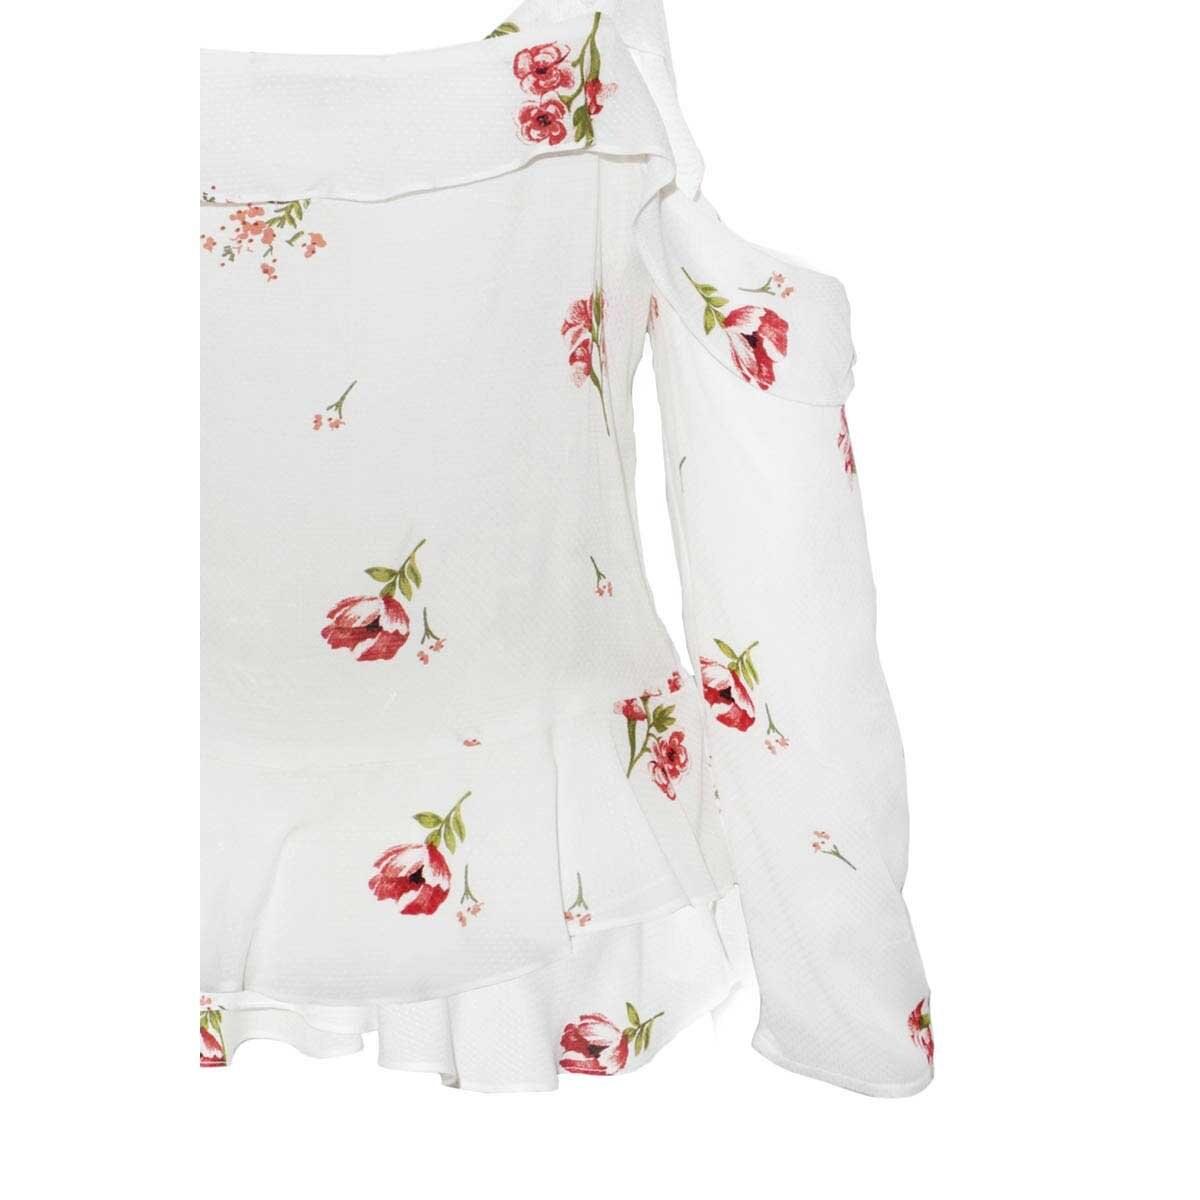 Blusa Estampada Wraps Yhasbel